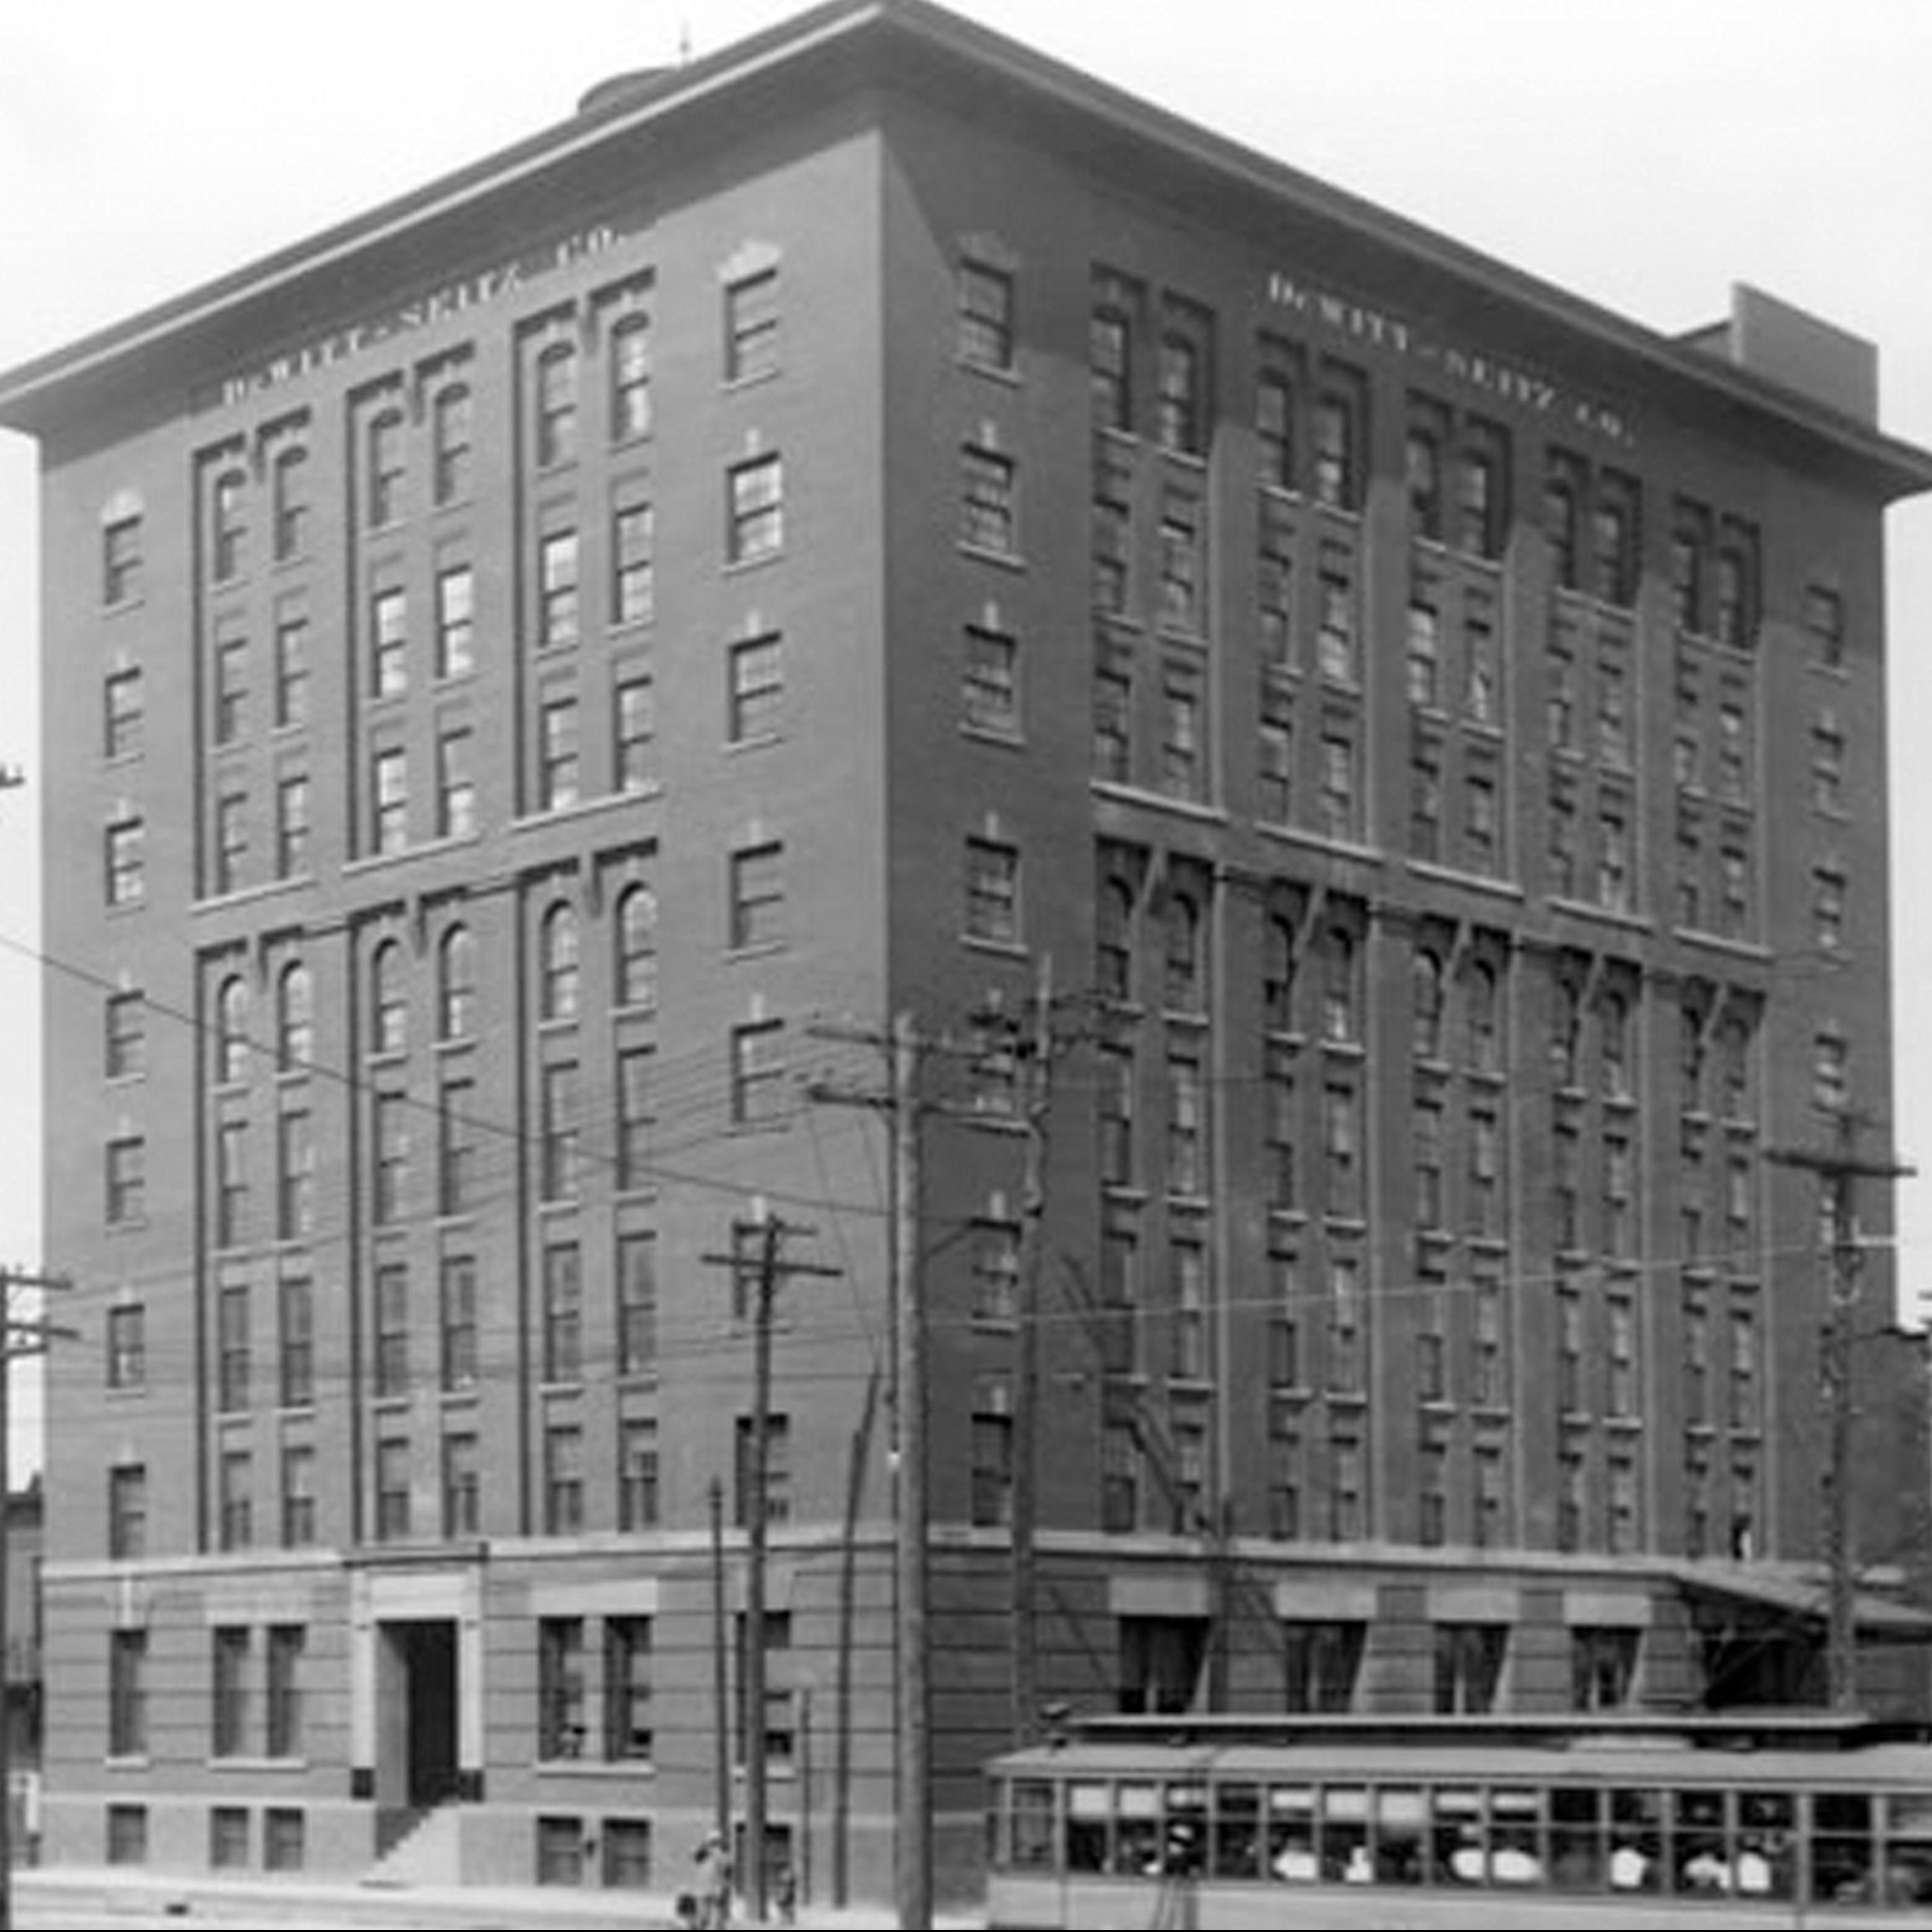 Old historical photo of DeWitt Seitz building